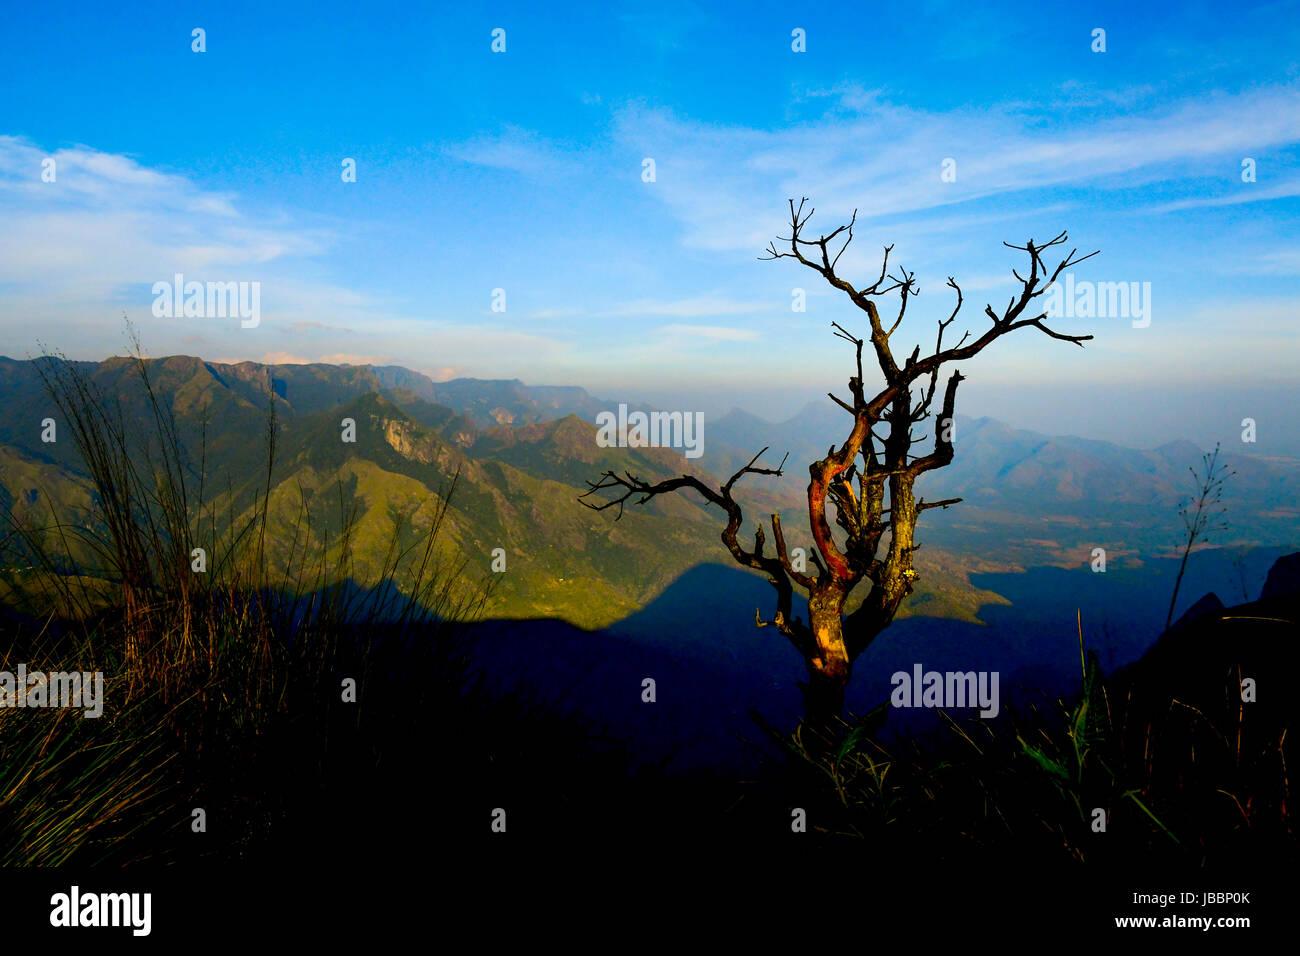 Stock Photo - Beautiful Kerala Landscape and Nature Sceneries - Stock Image